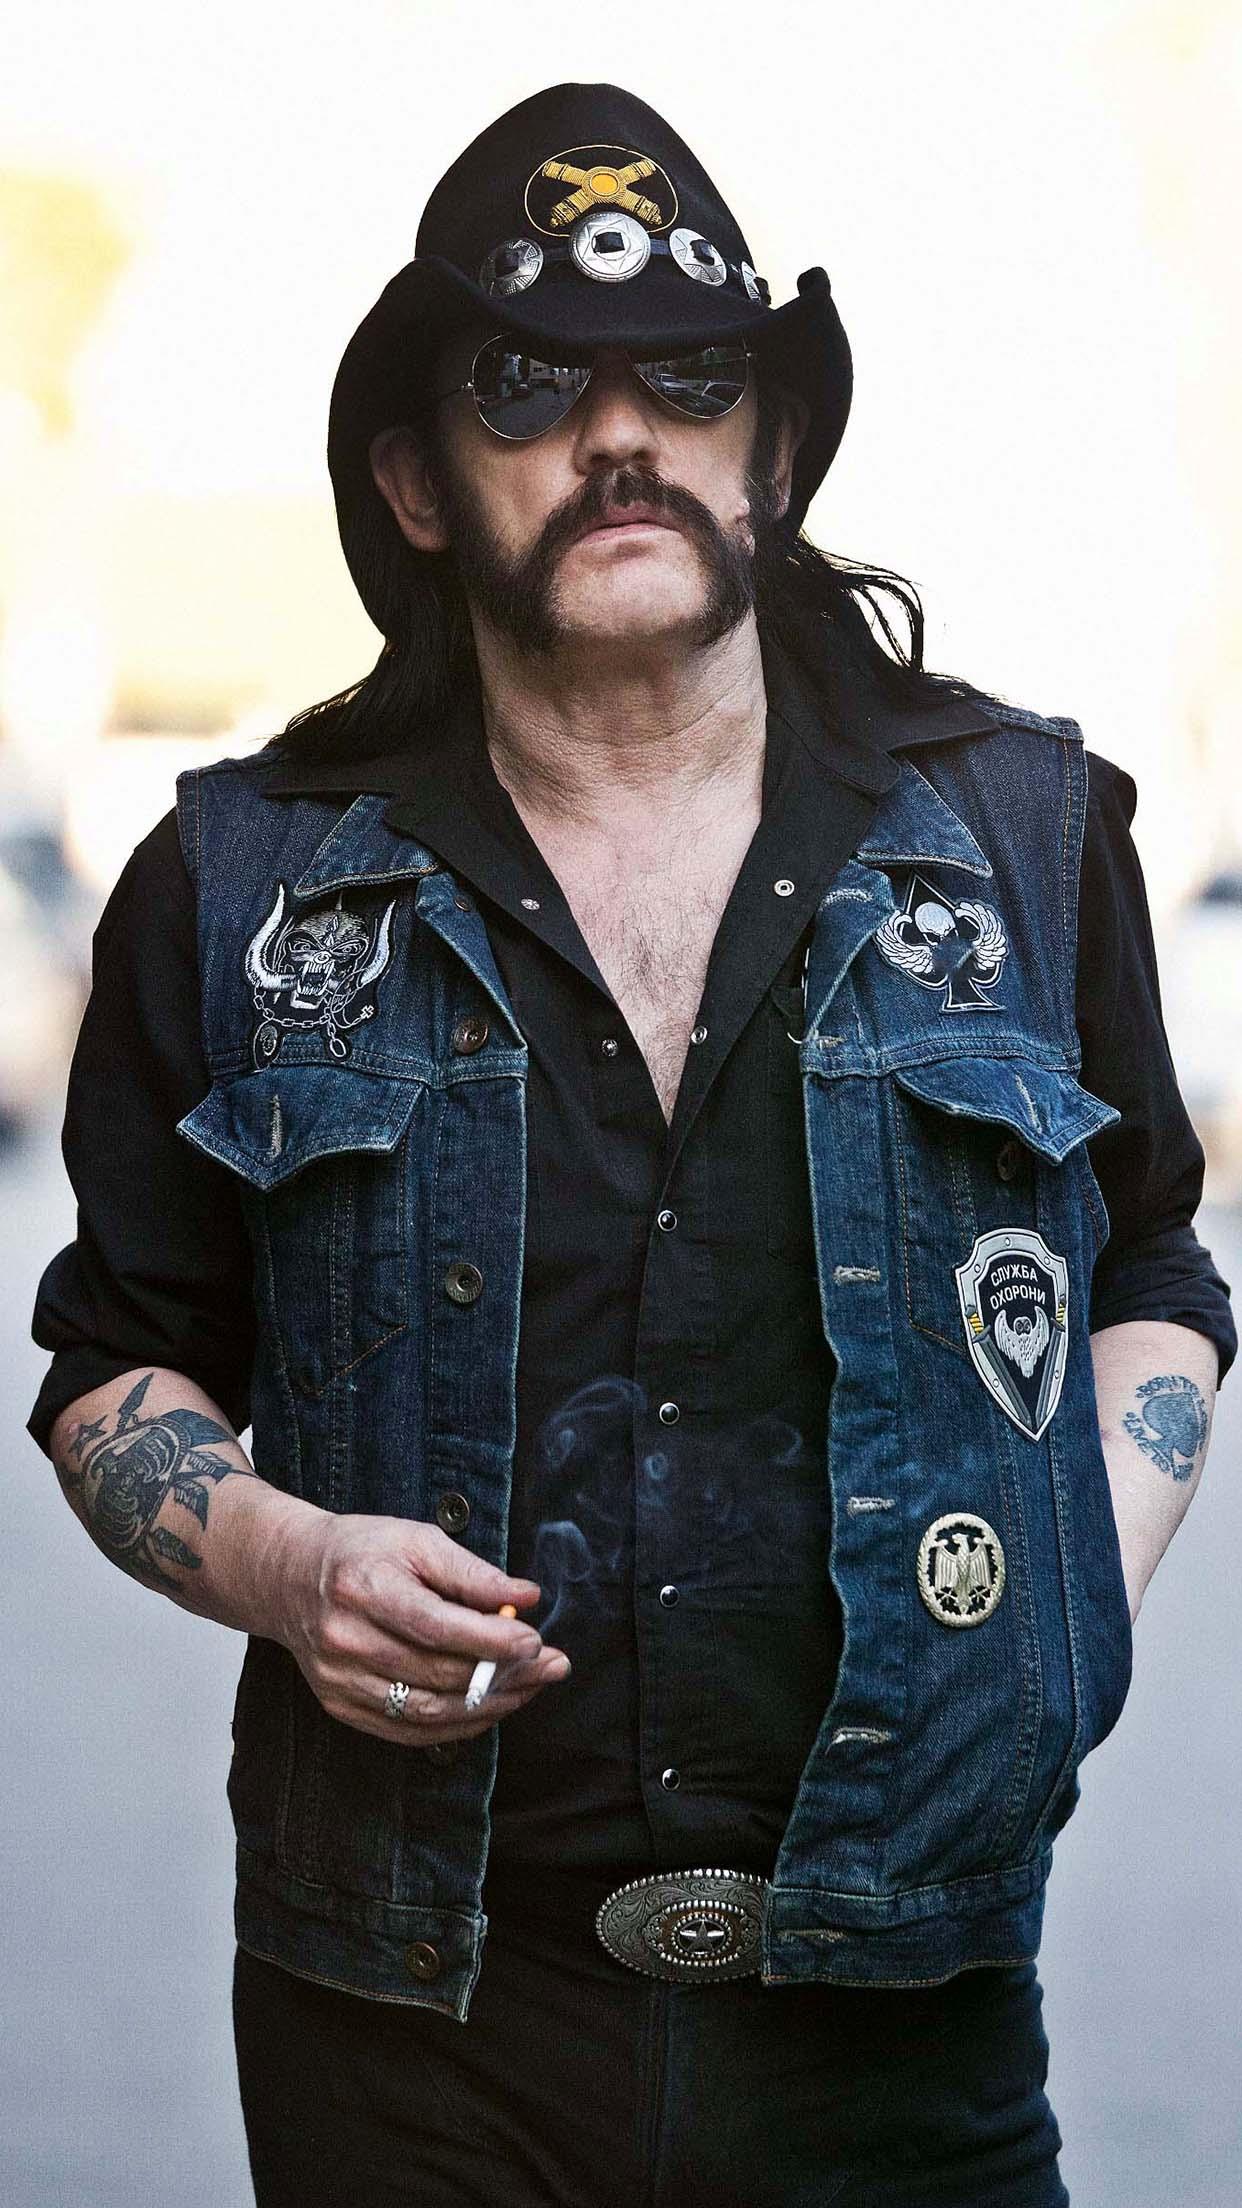 Motörhead Lemmy Kilmister 3Wallpapers iPhone Parallax Lemmy Kilmister